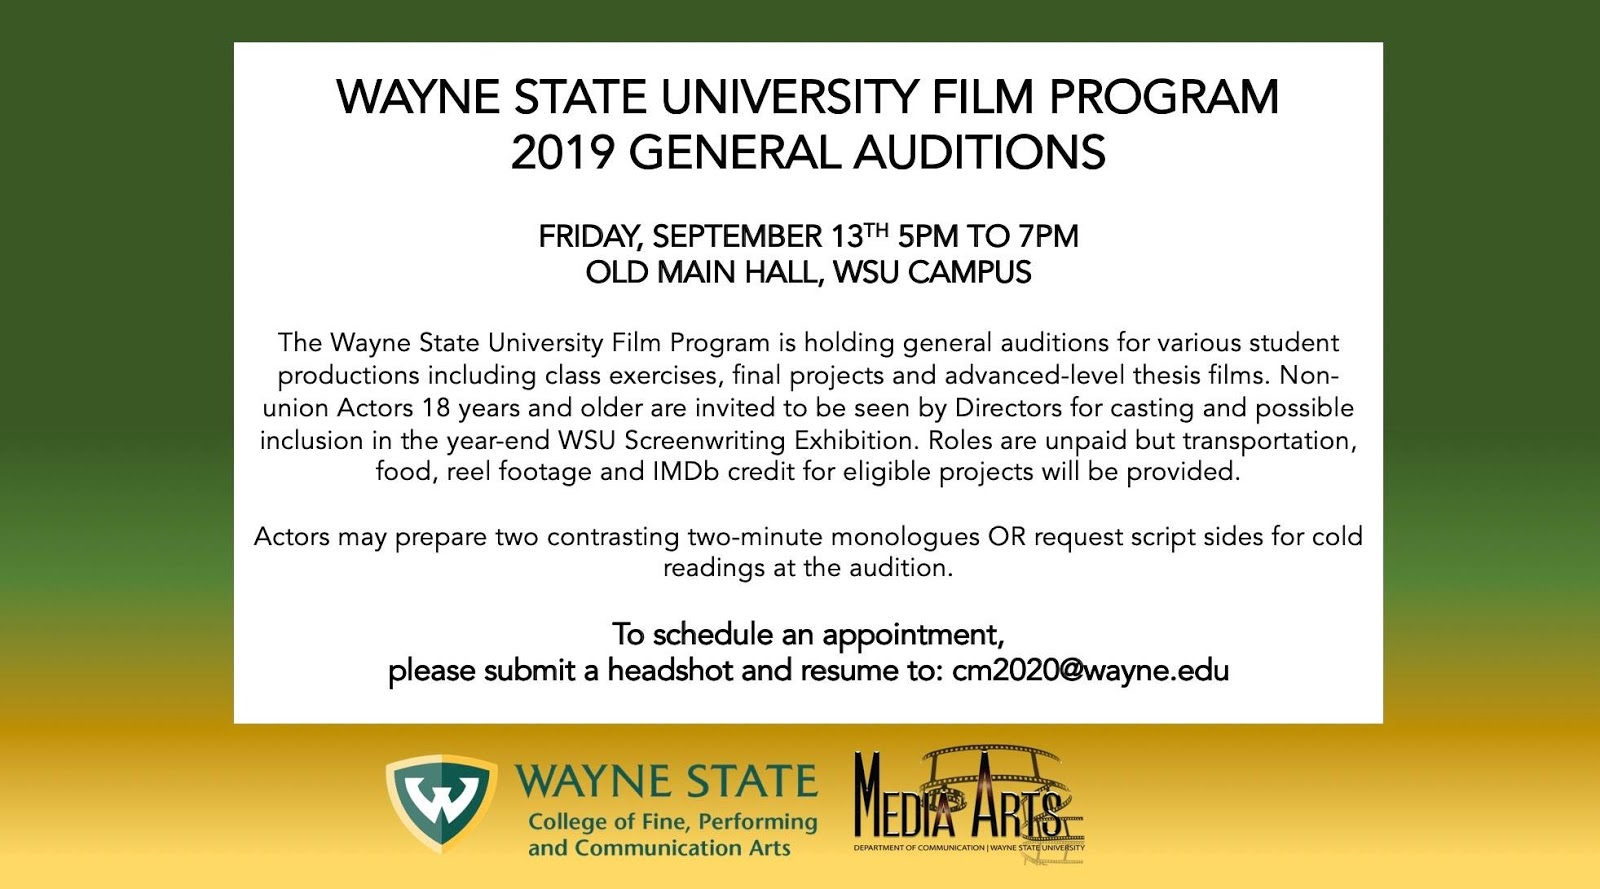 WSU Media Arts: WSU Student Film Auditions